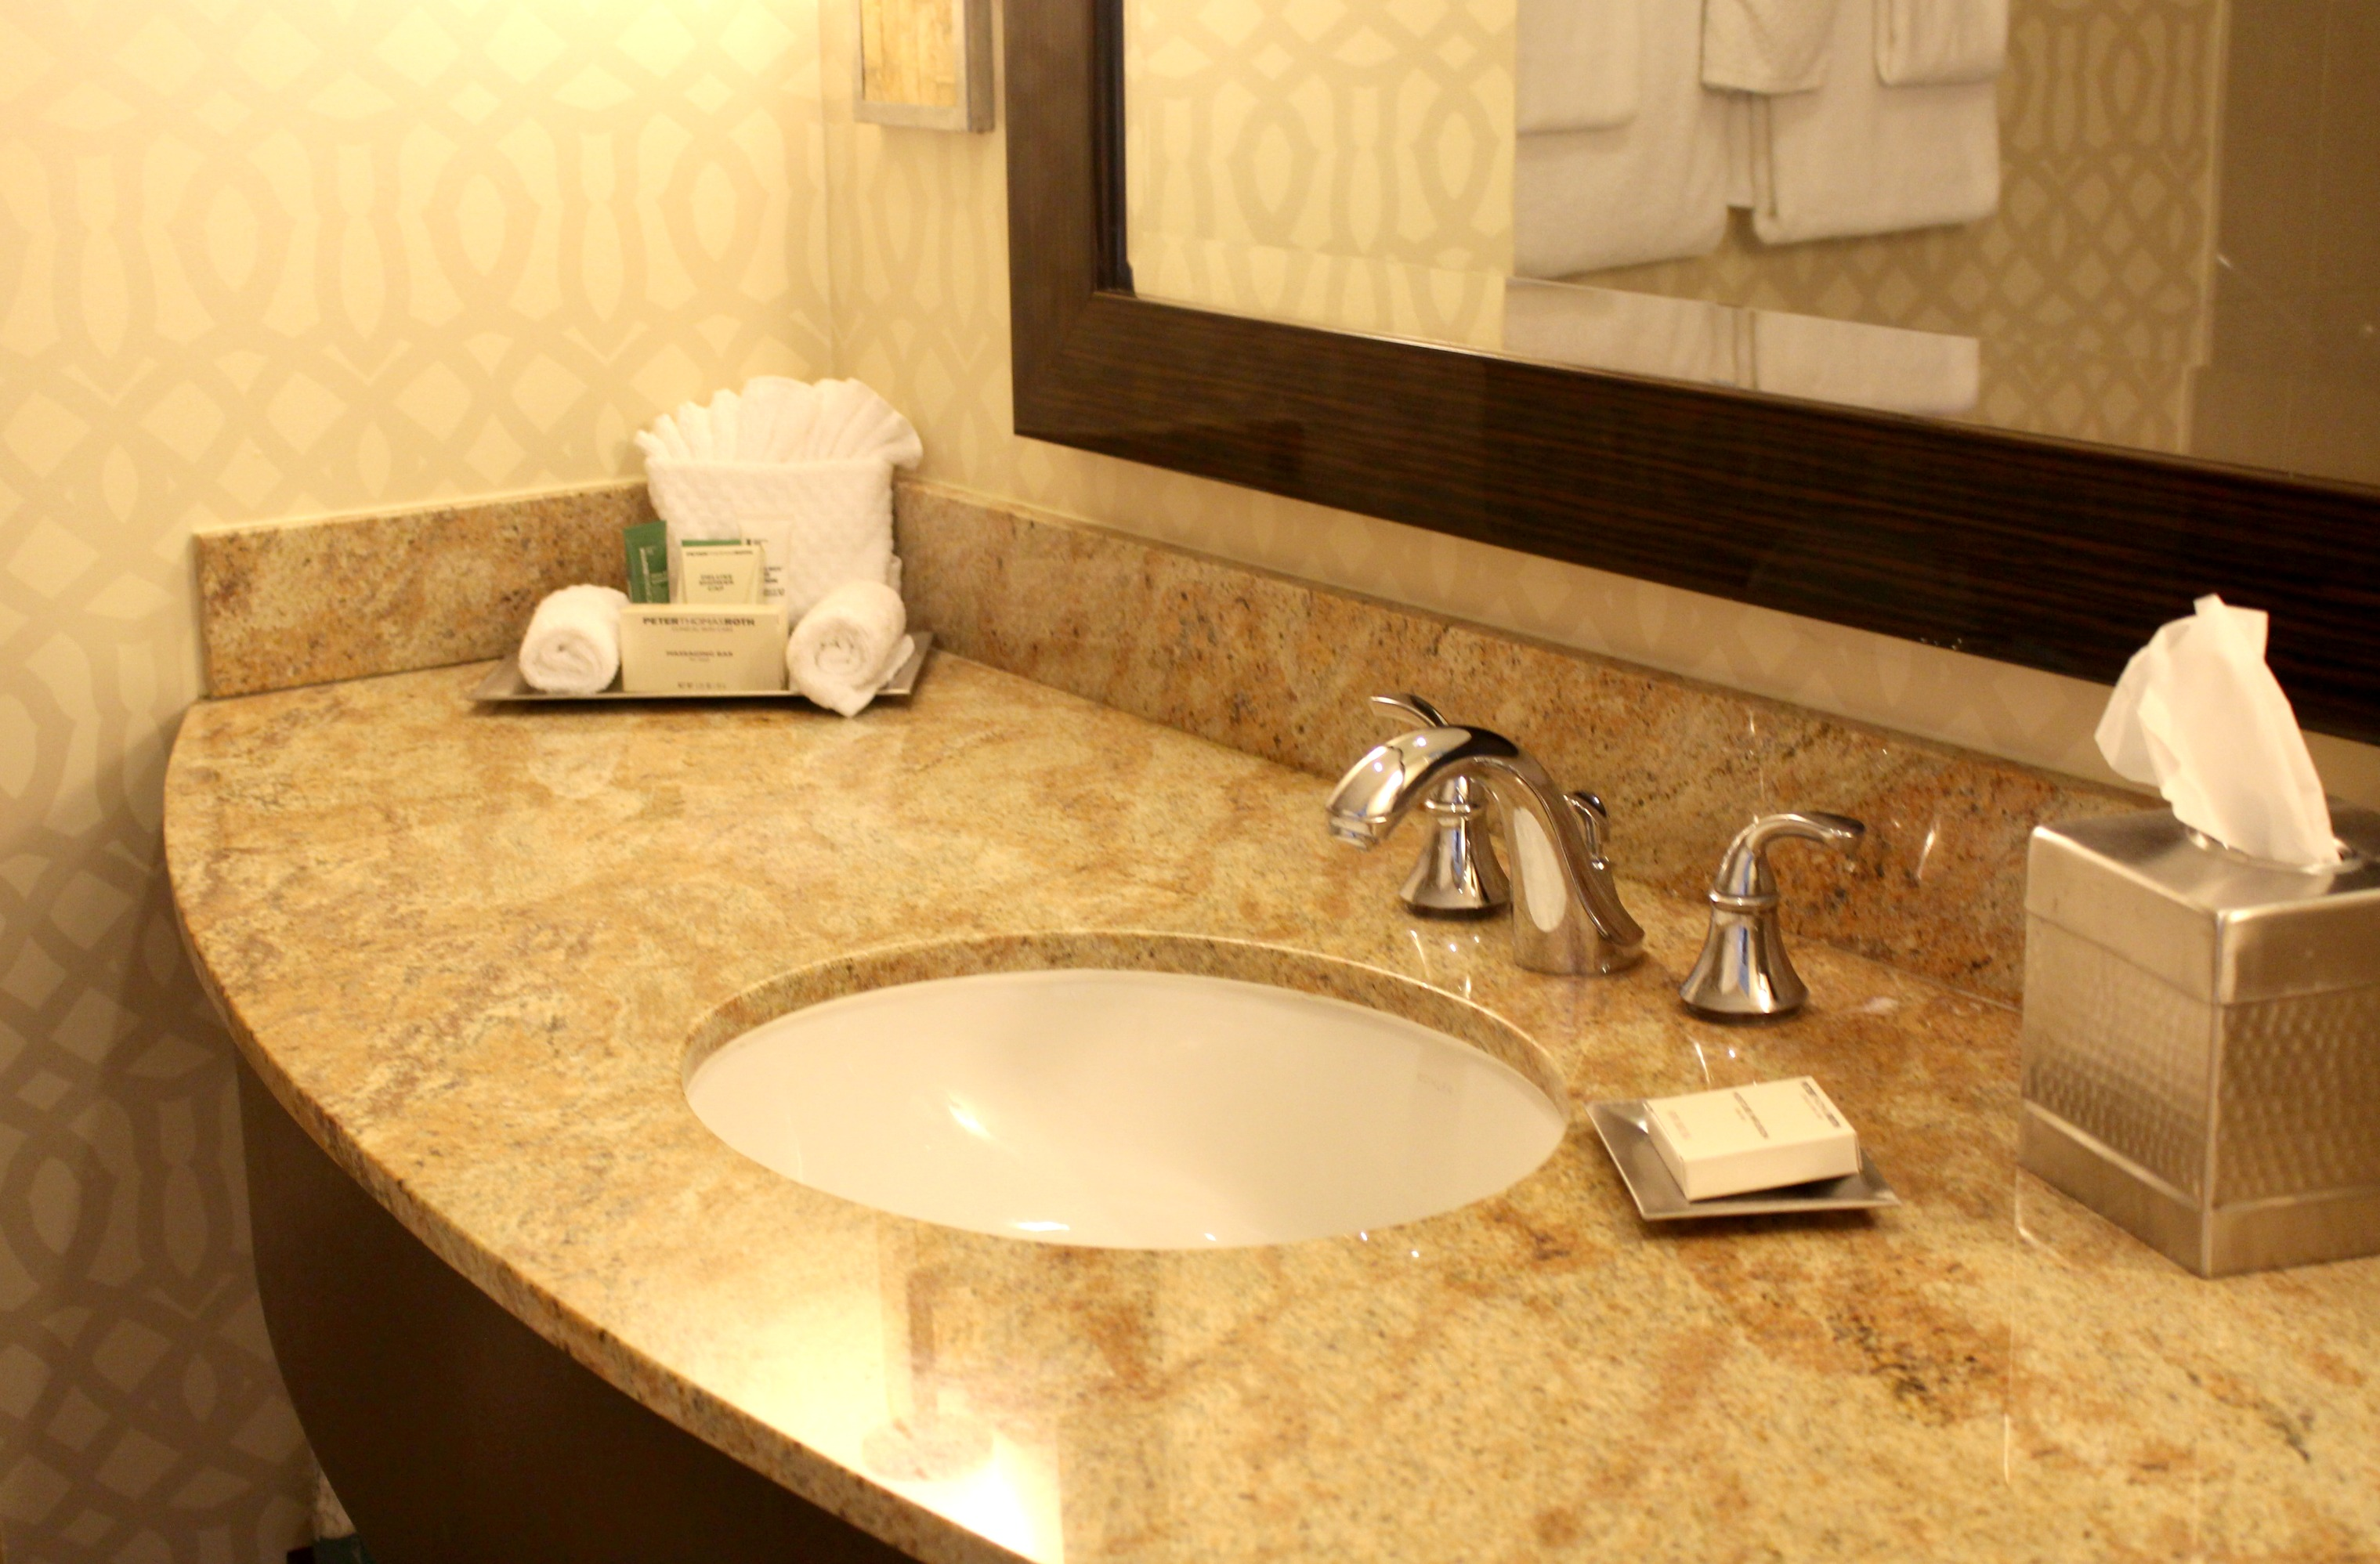 Hilton-Bonnet-Creek-Disney-Resort-Bathroom